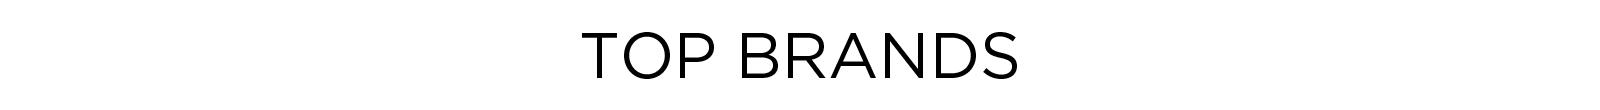 Promo Banner